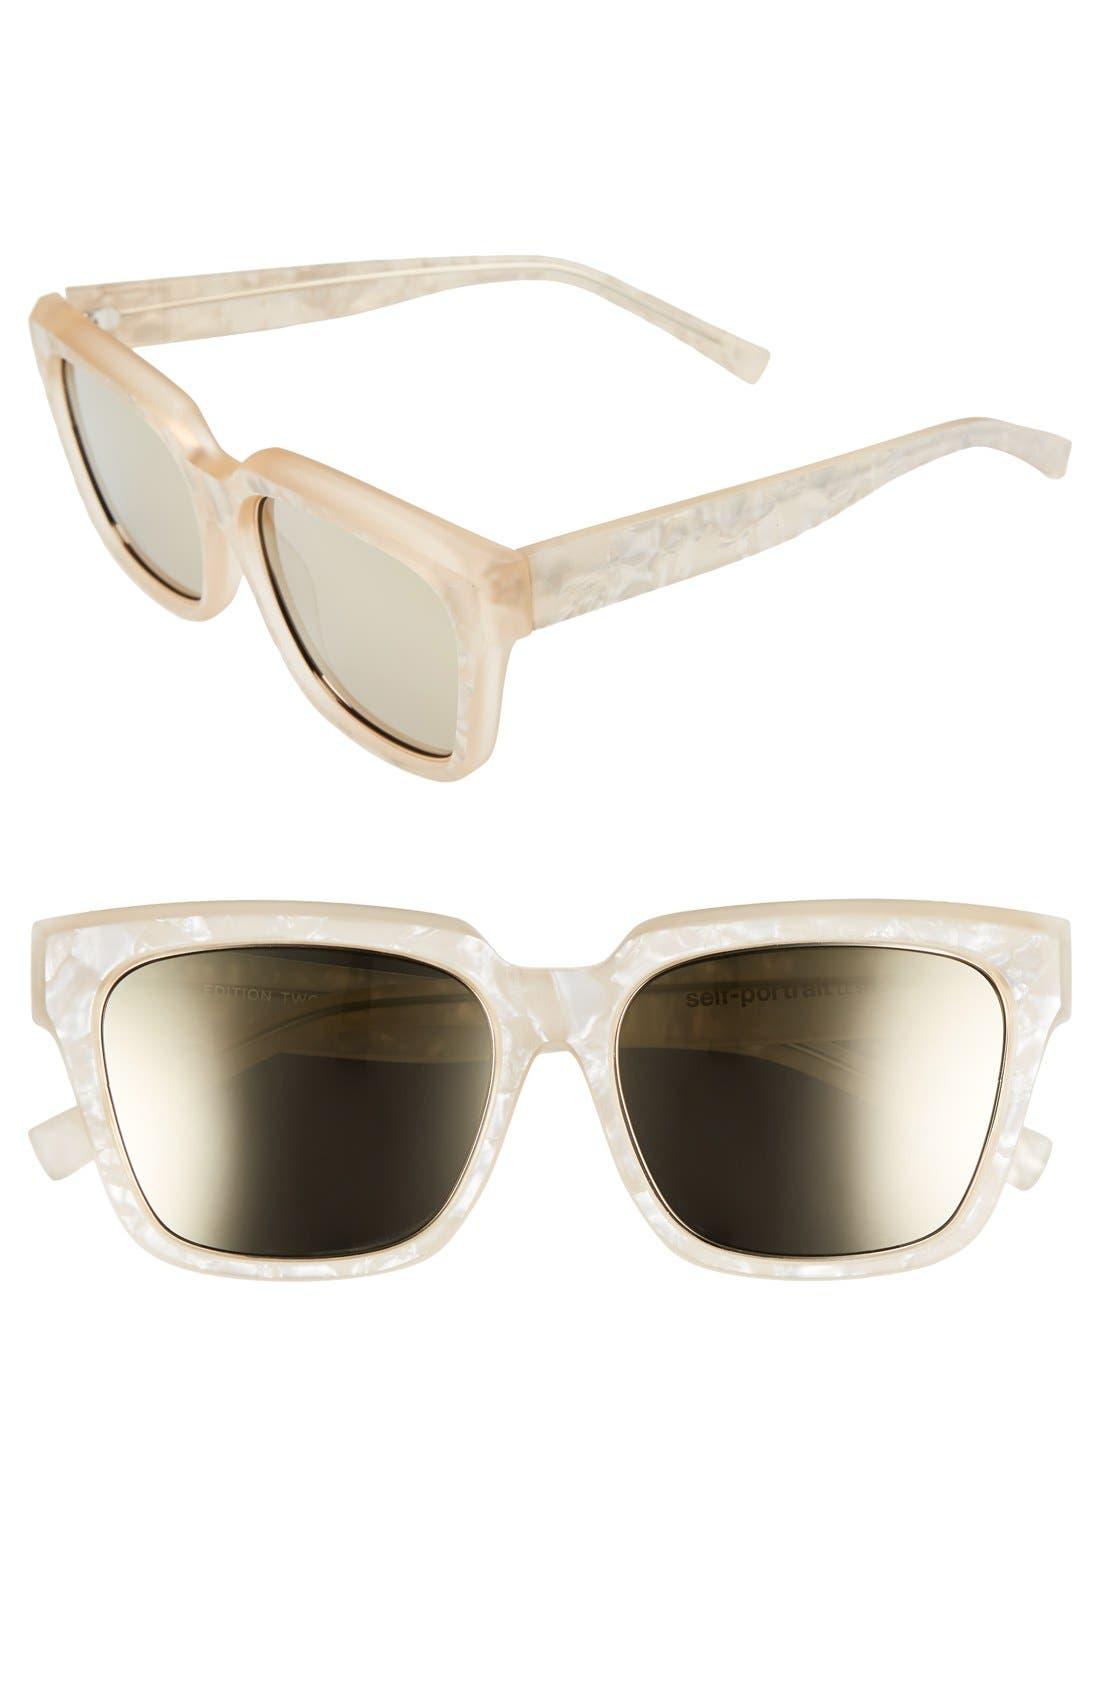 LE SPECS Edition Two 55mm Sunglasses